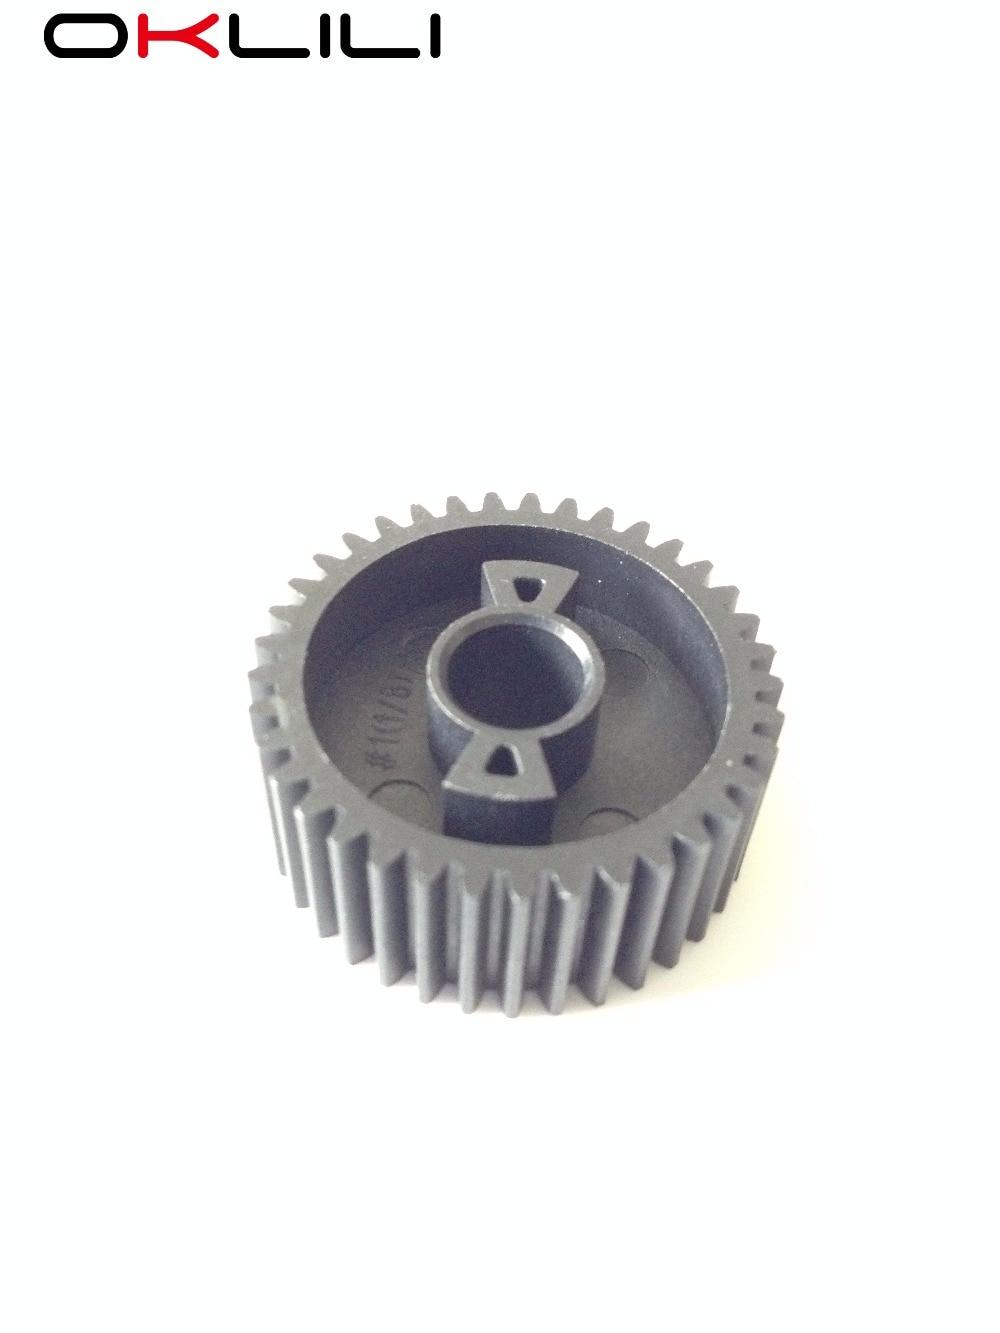 50X JC66-01637A Outer Fuser Drive Gear for Samsung ML2850 ML2851 ML2855 SCX4824 SCX4825 SCX4826 SCX4828 for Xerox 3250 3210 3220 картридж samsung scx 4824 4828 mlt d209l see